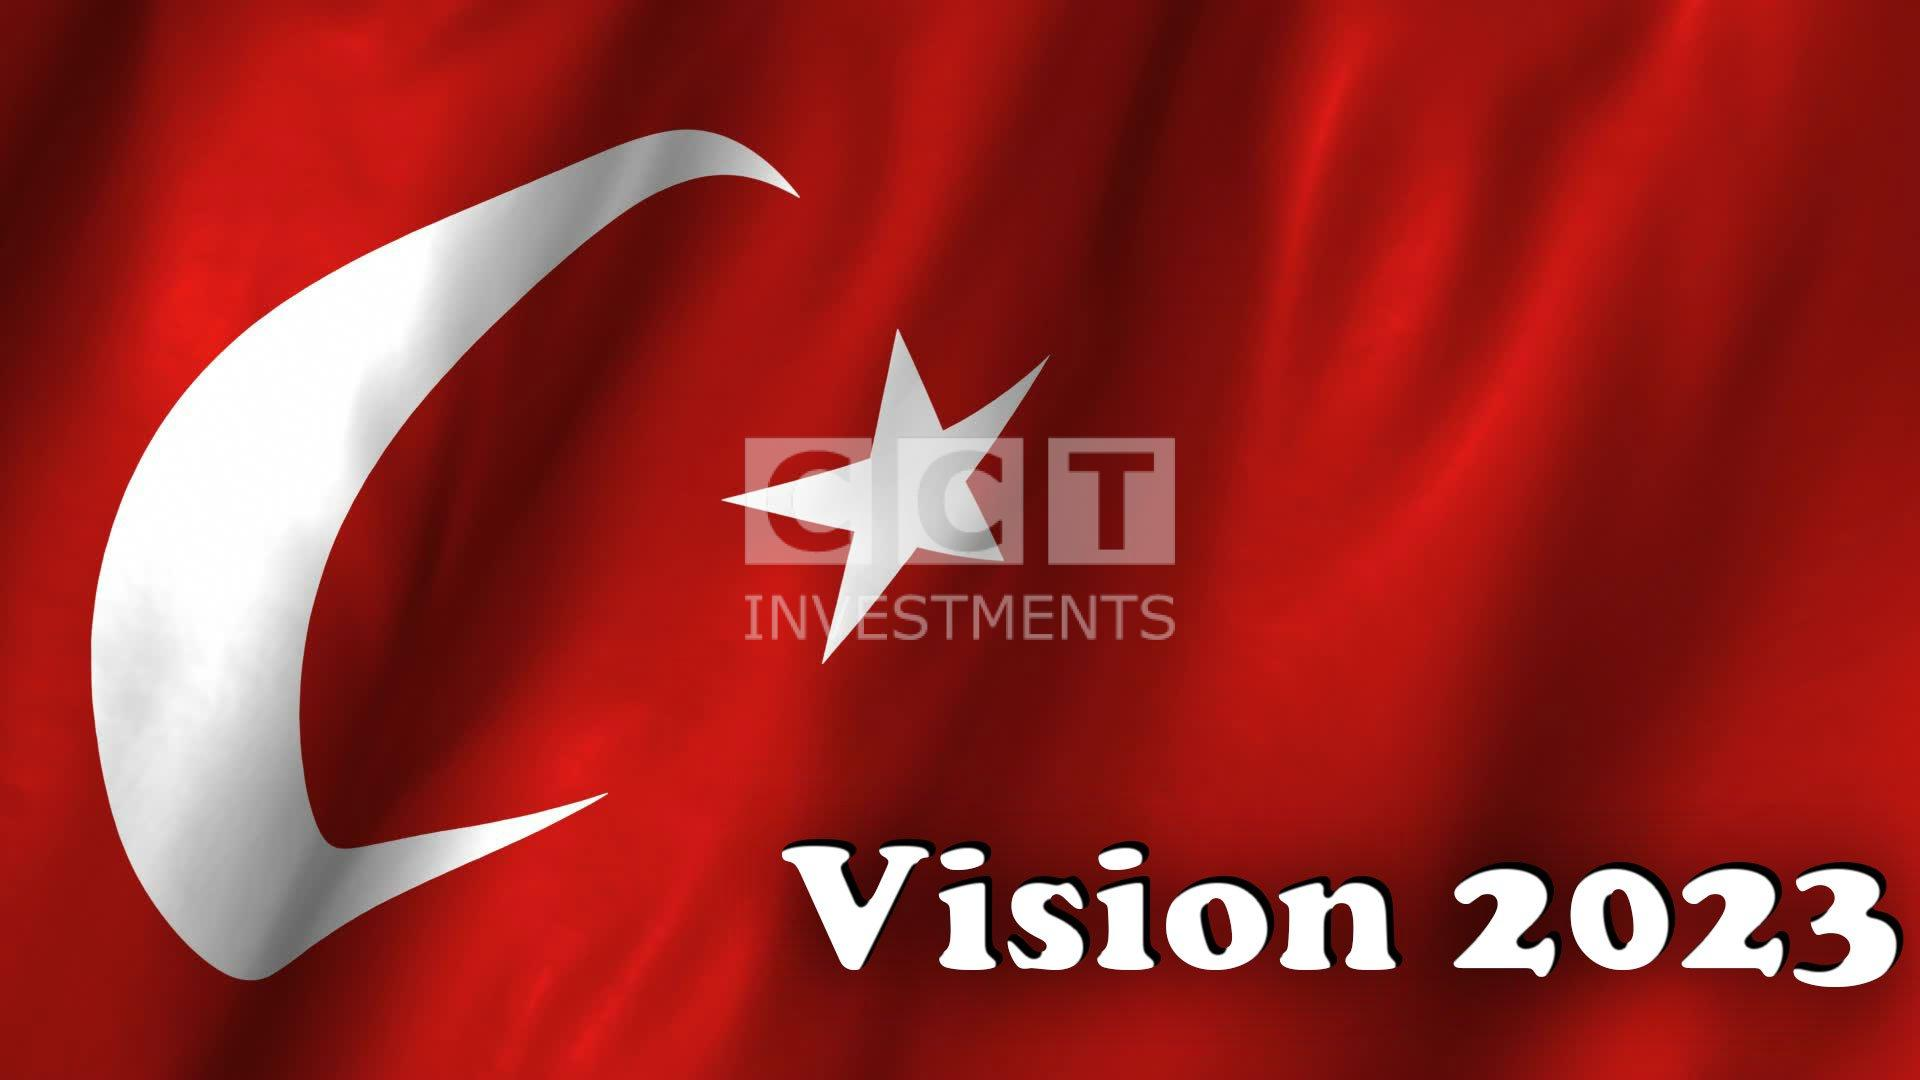 Turkey's 2023 vision image